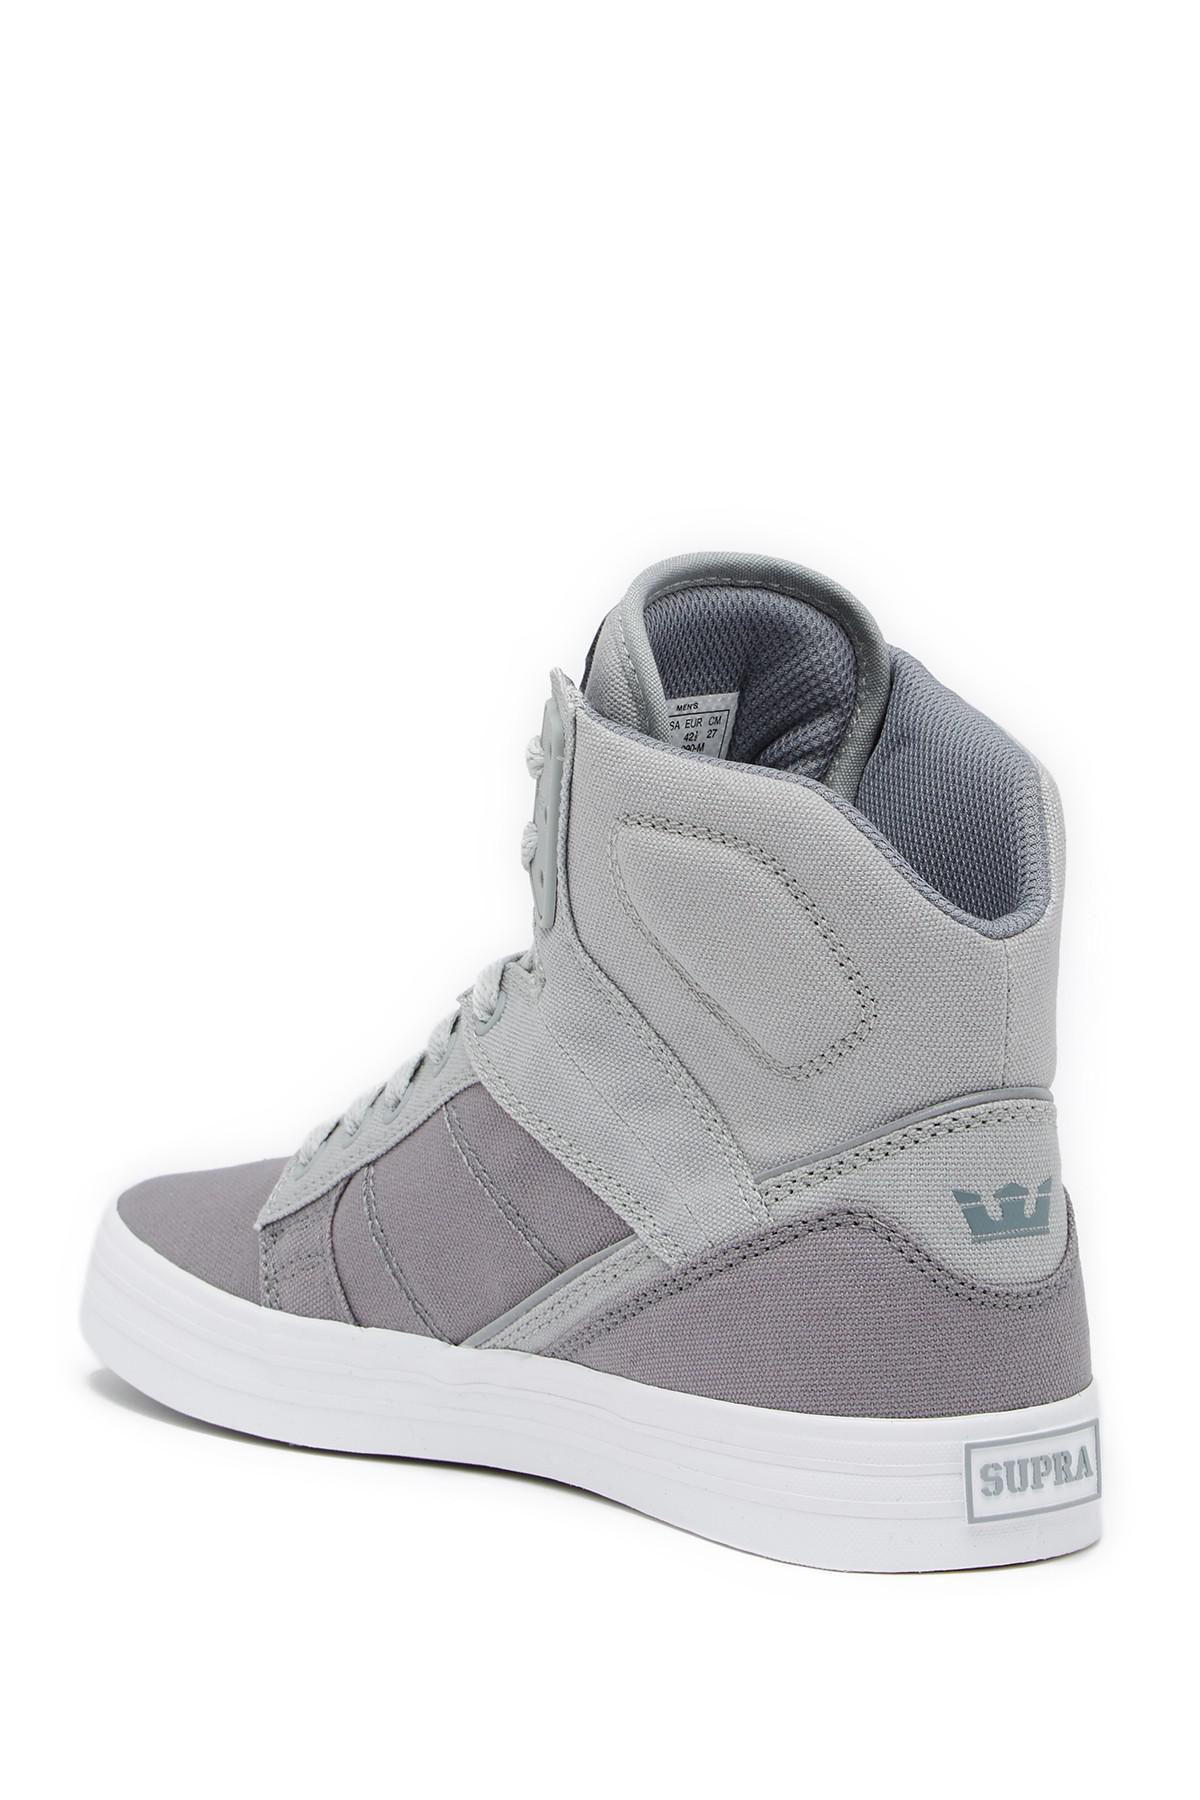 CAMPER Domus Leather High-Top Sneaker VlNdsQIwn